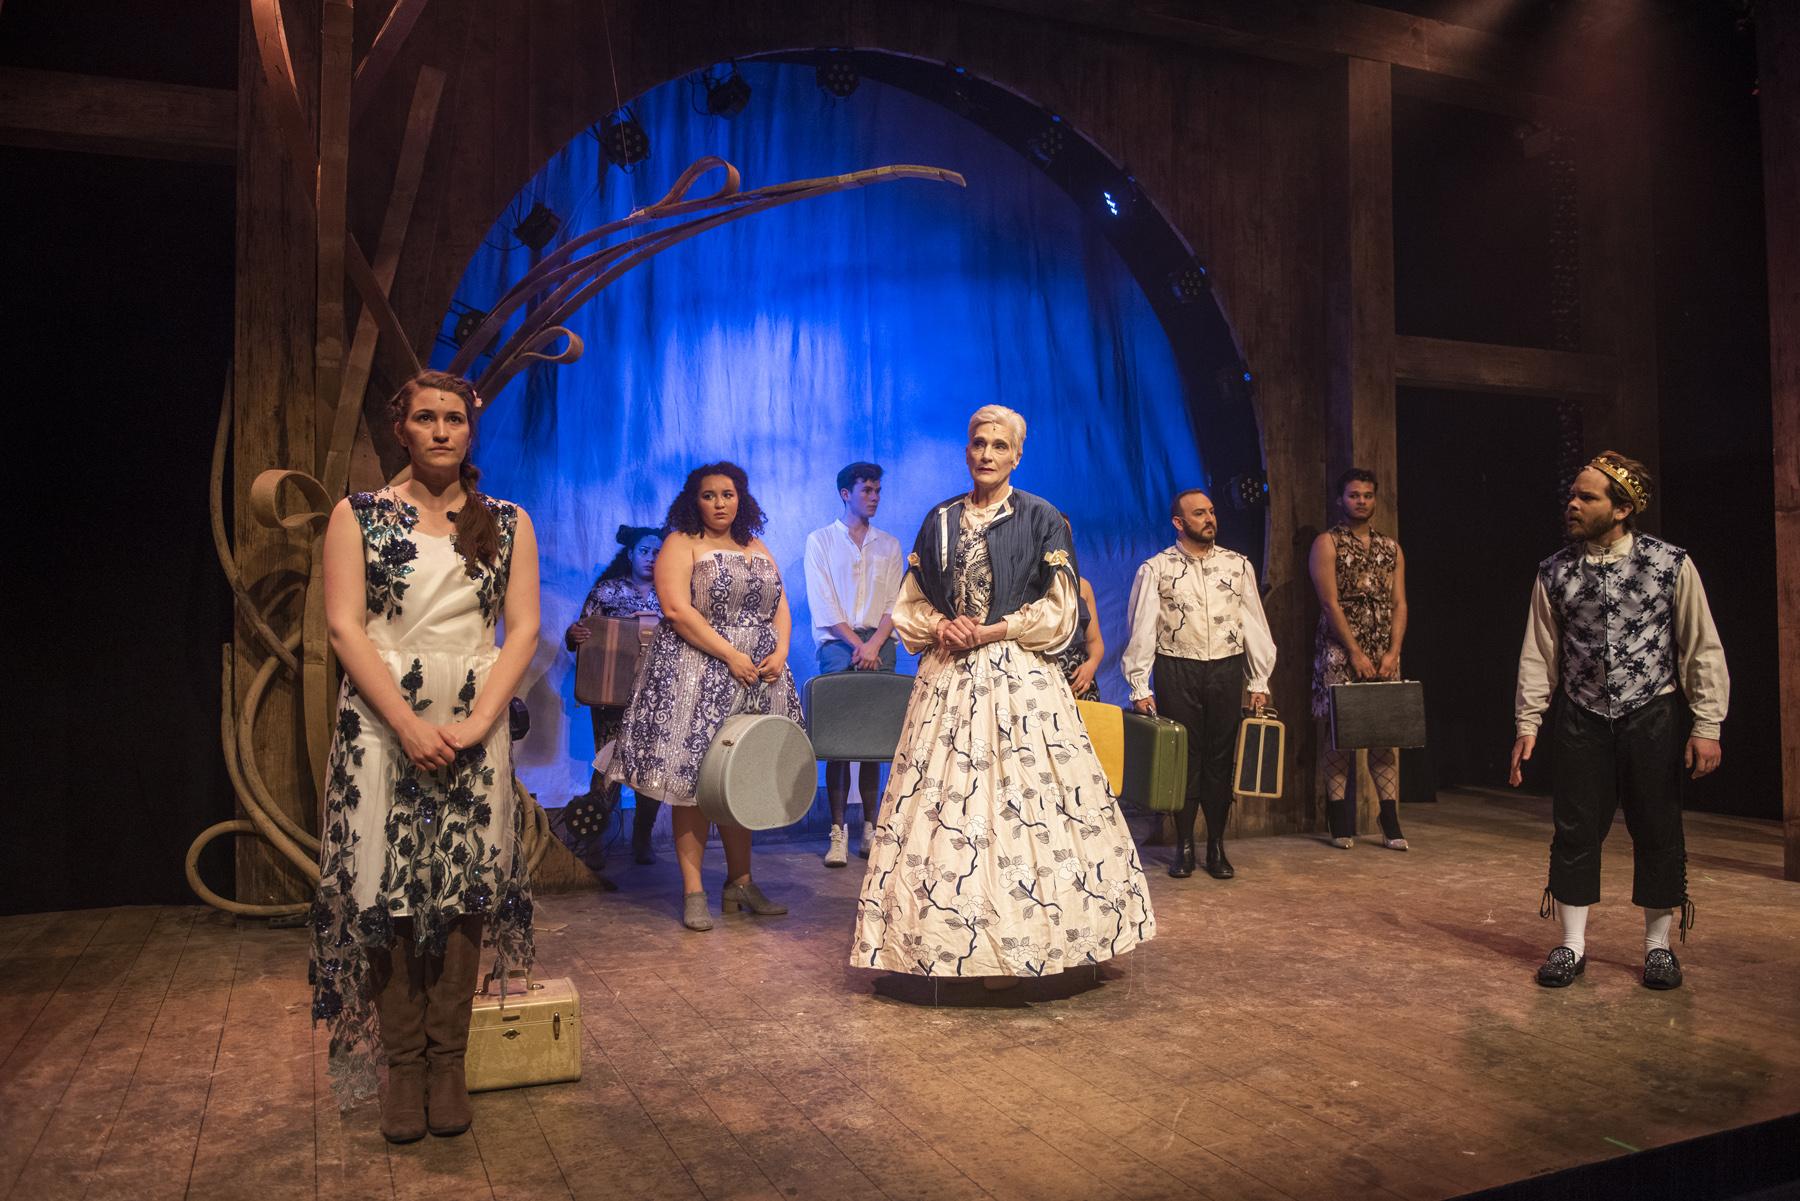 Philoclea (Caitlyn Cerza), Pamela (Bridget Adams-King), Queen Gynecia (Liz Norton), and King Basilius (Frankie Leo Bennett) with Ensemble